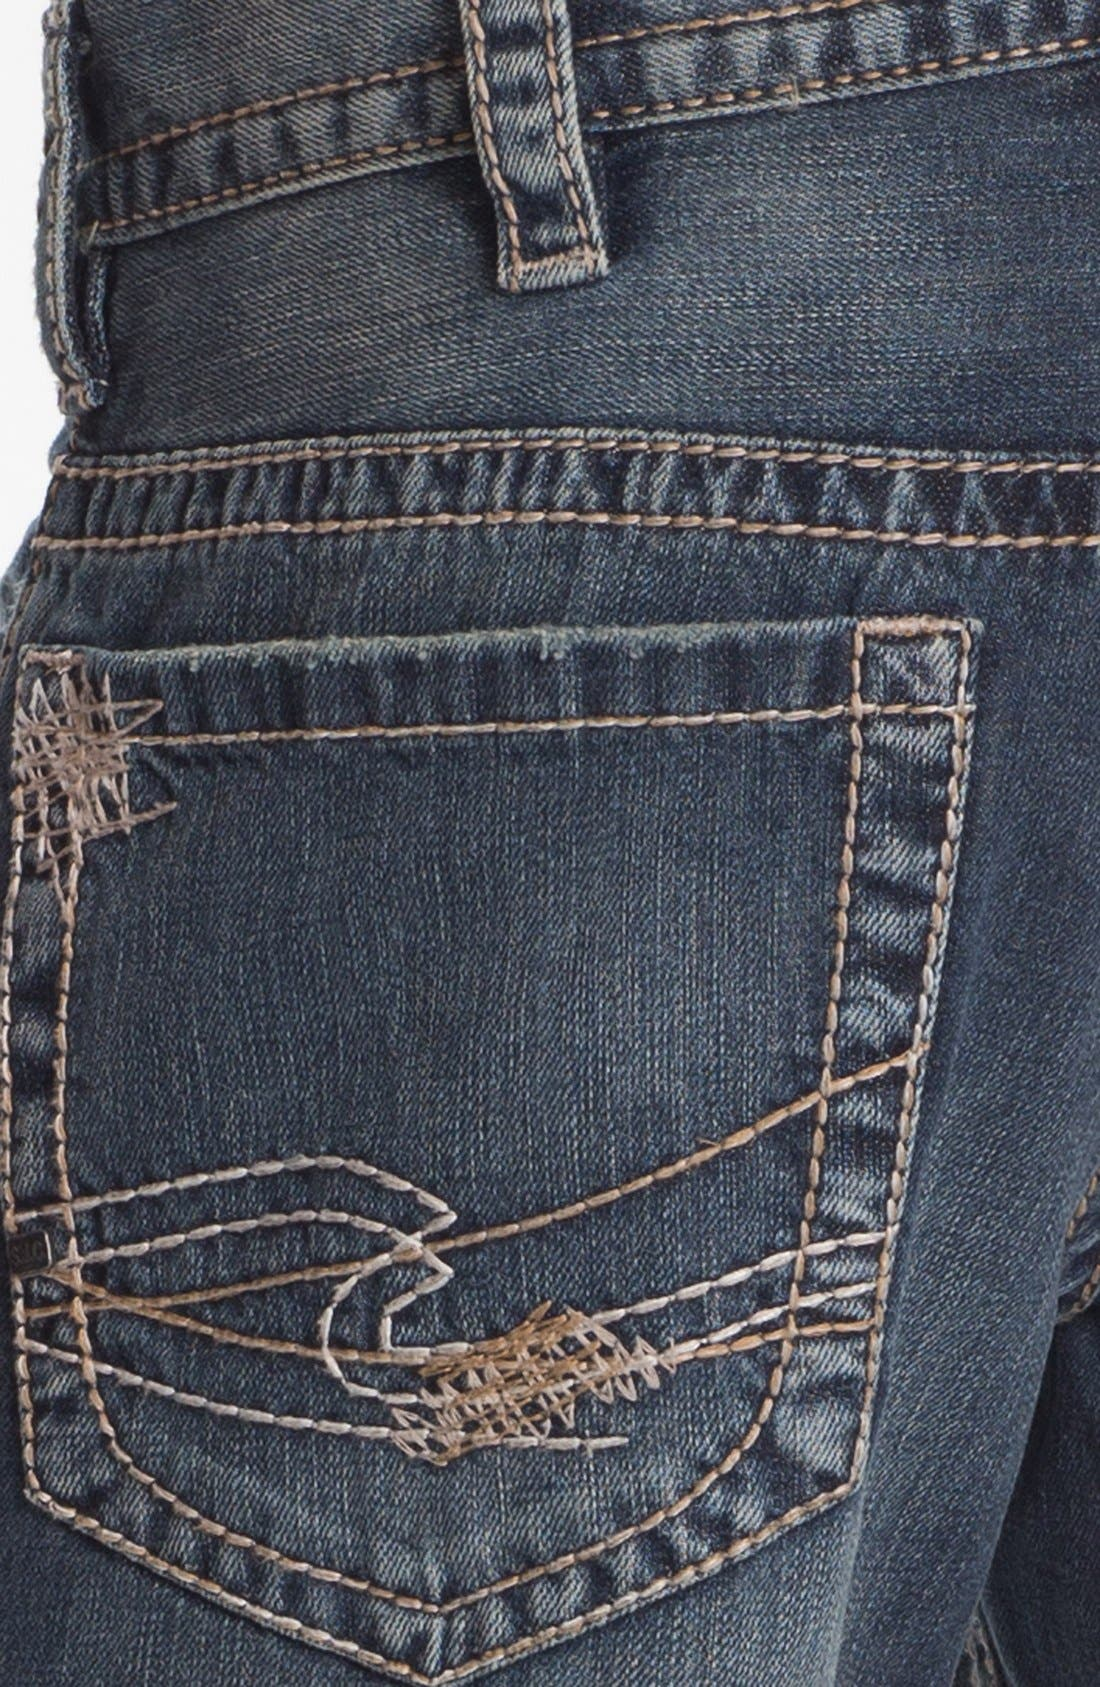 Alternate Image 4  - Silver Jeans Co. 'Gordie' Bootcut Jeans (Indigo)